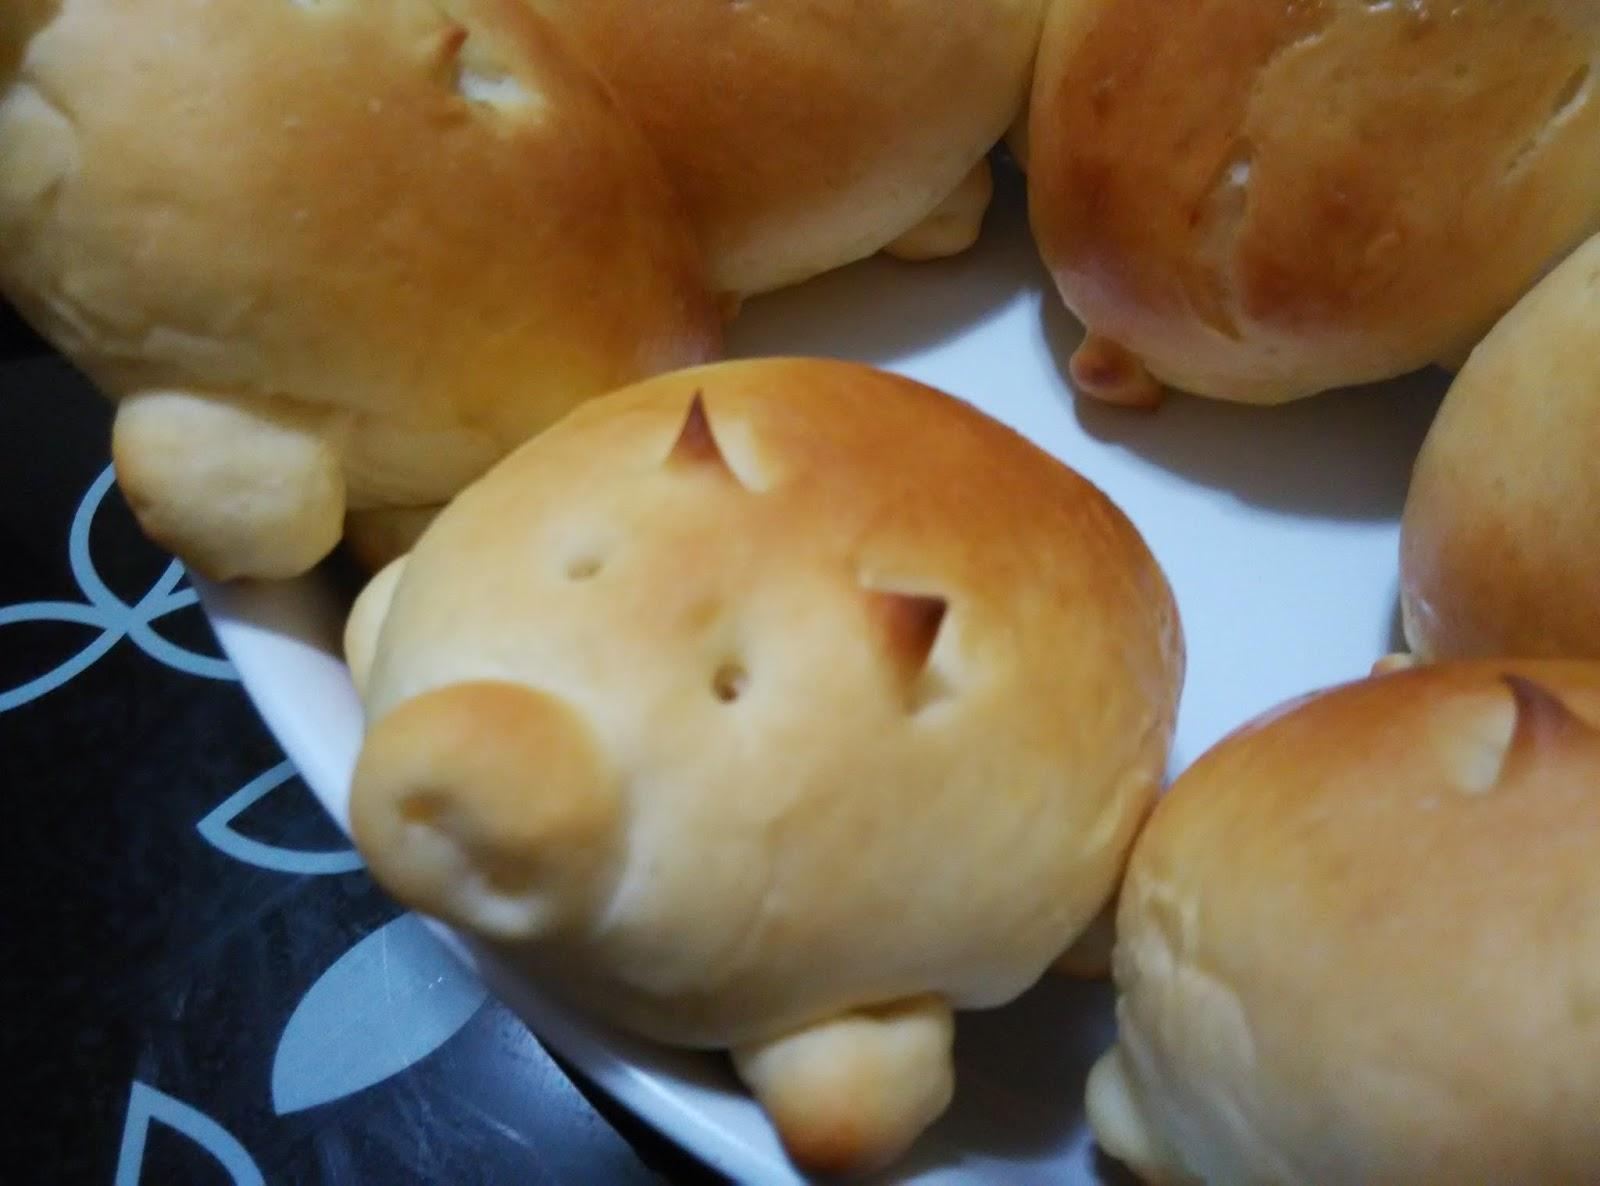 Cute-Pig-Hotdog-Bread-Bun